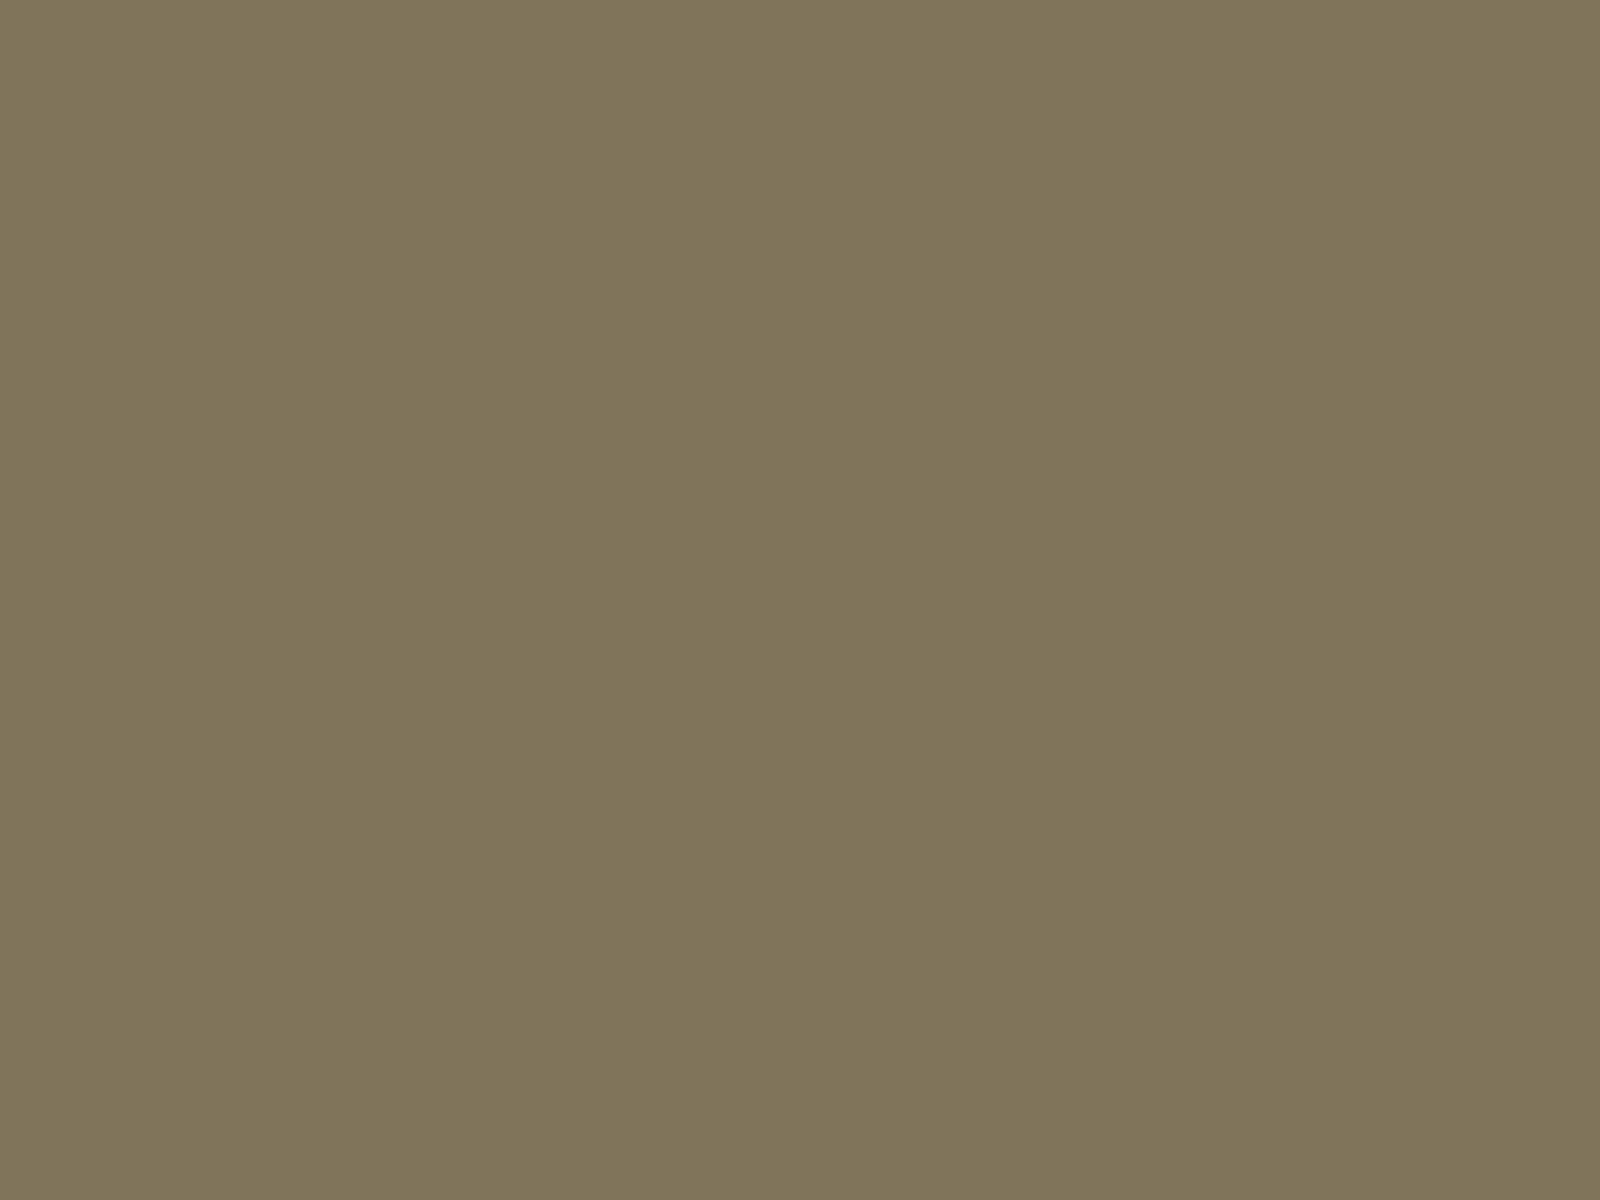 1600x1200 Spanish Bistre Solid Color Background